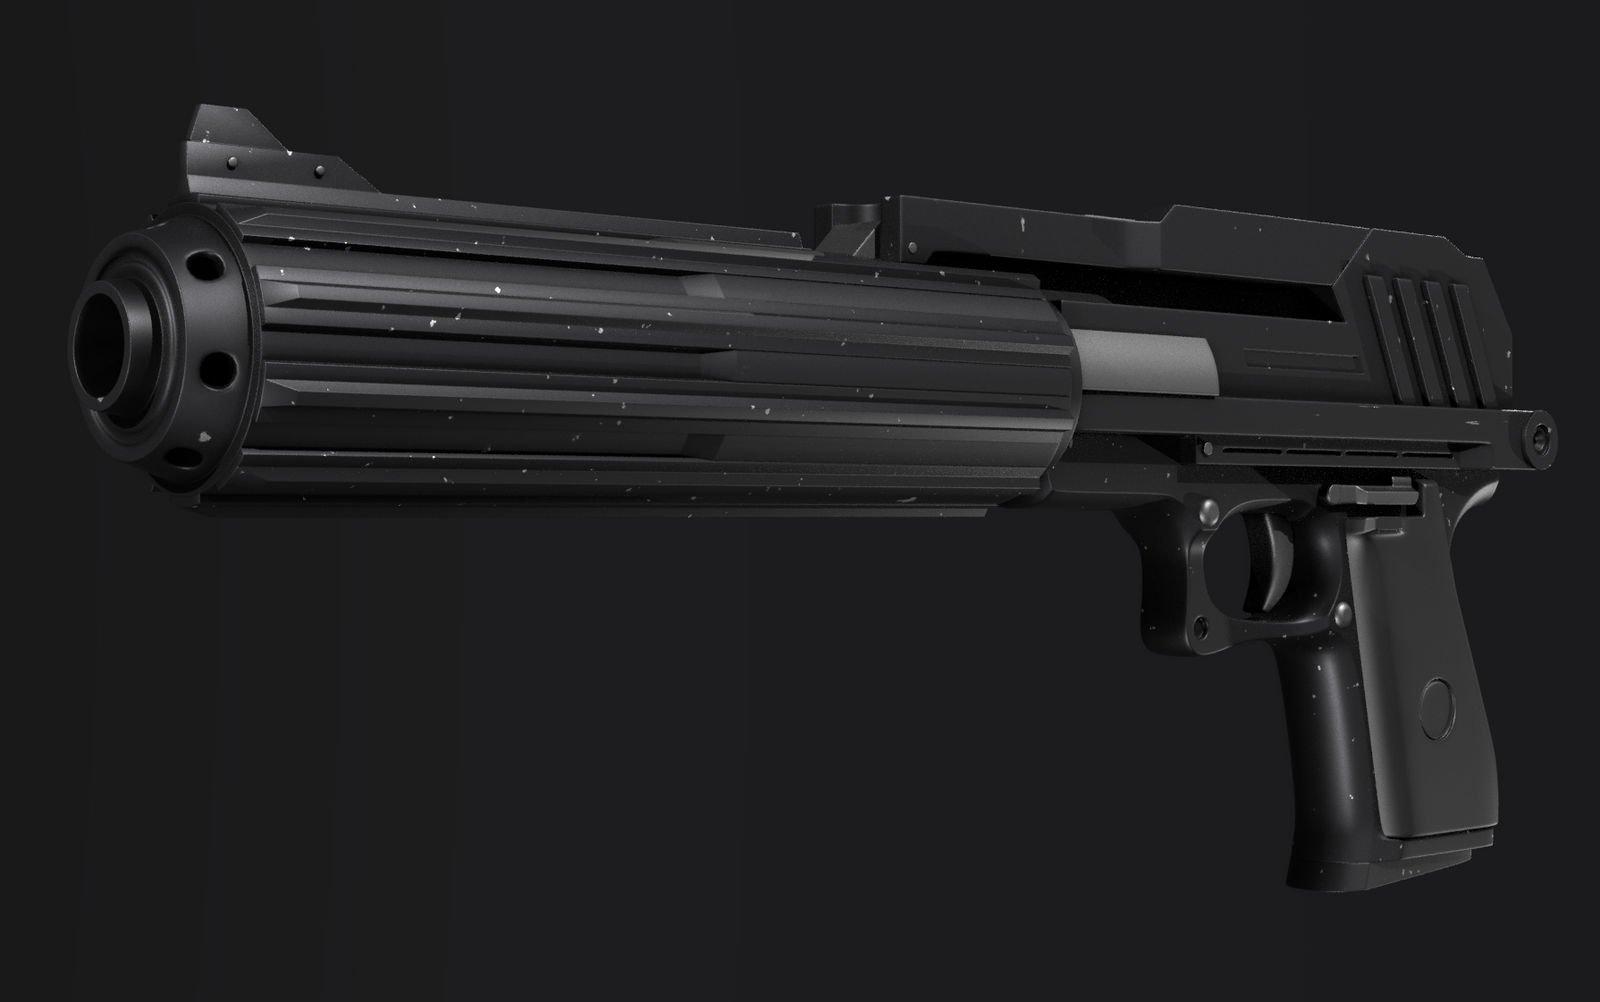 captain_fordo_s_blaster_pistol_by_hazakh